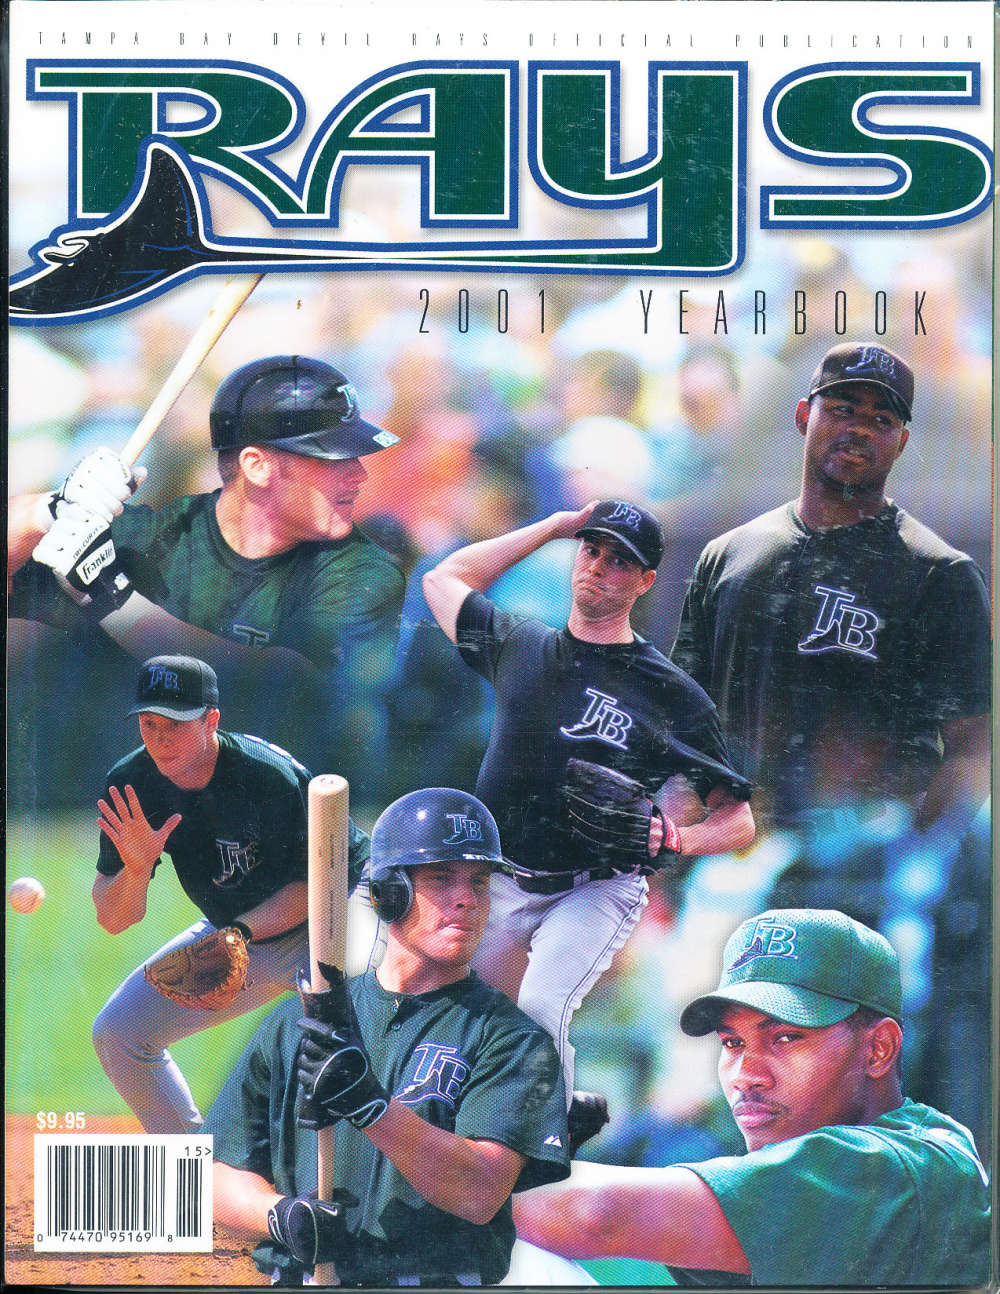 2001 Tampa Bay Devil Rays Baseball Yearbook